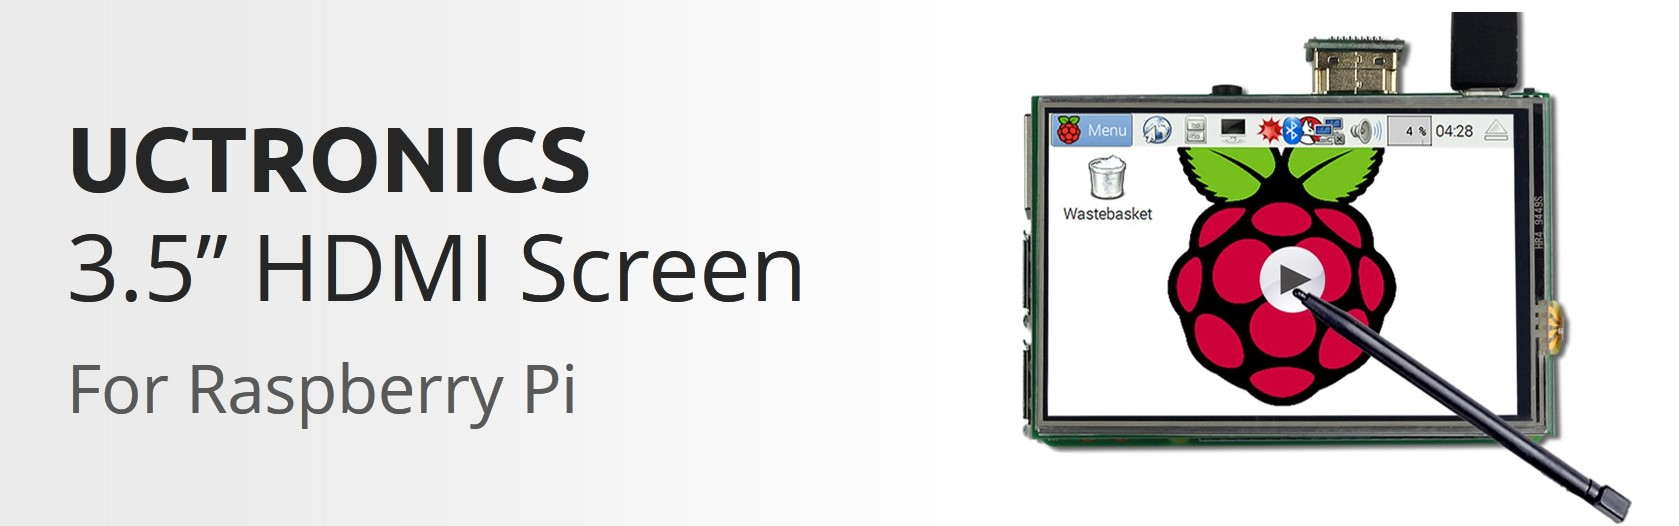 uctronics_3.5_inch_hdmi_screen_blog